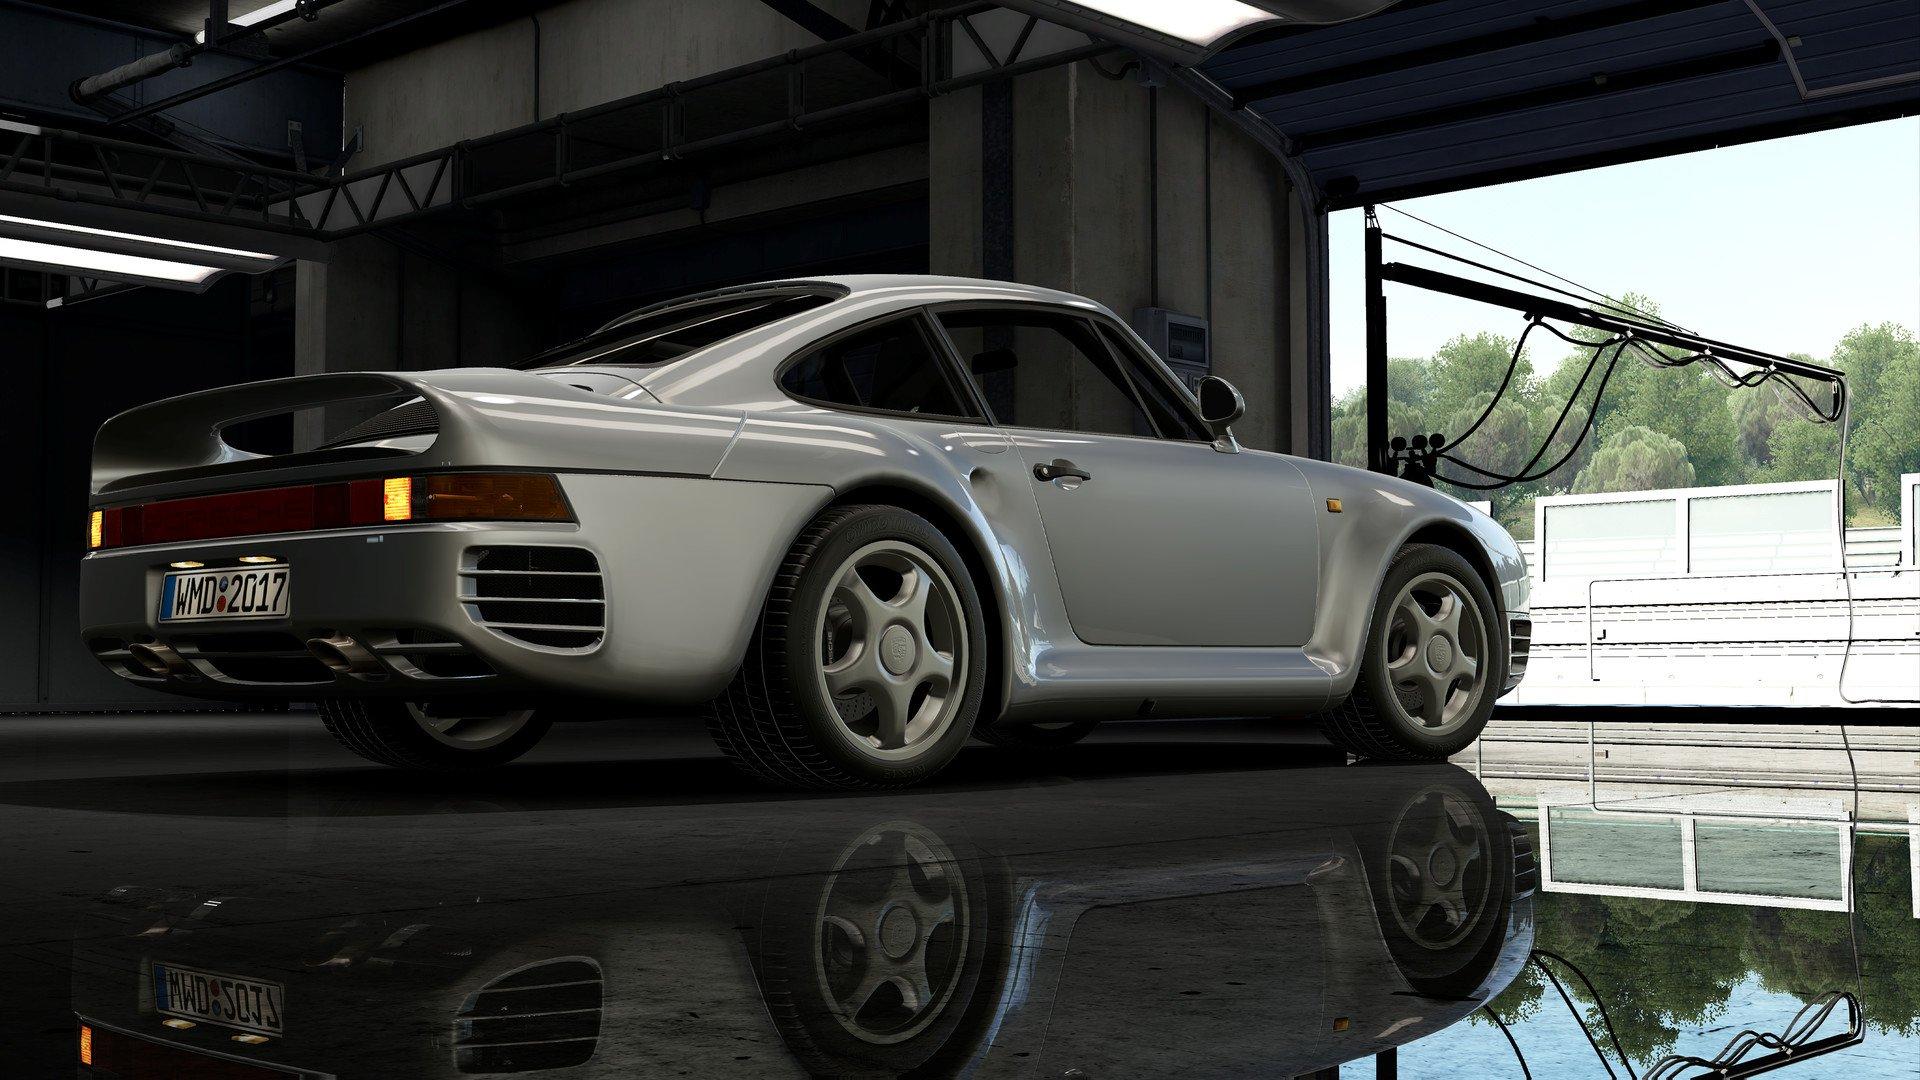 Project Cars 2 Porsche Legends Pack Adds Porsche 959 Leipzig Test Track And Other Rarities